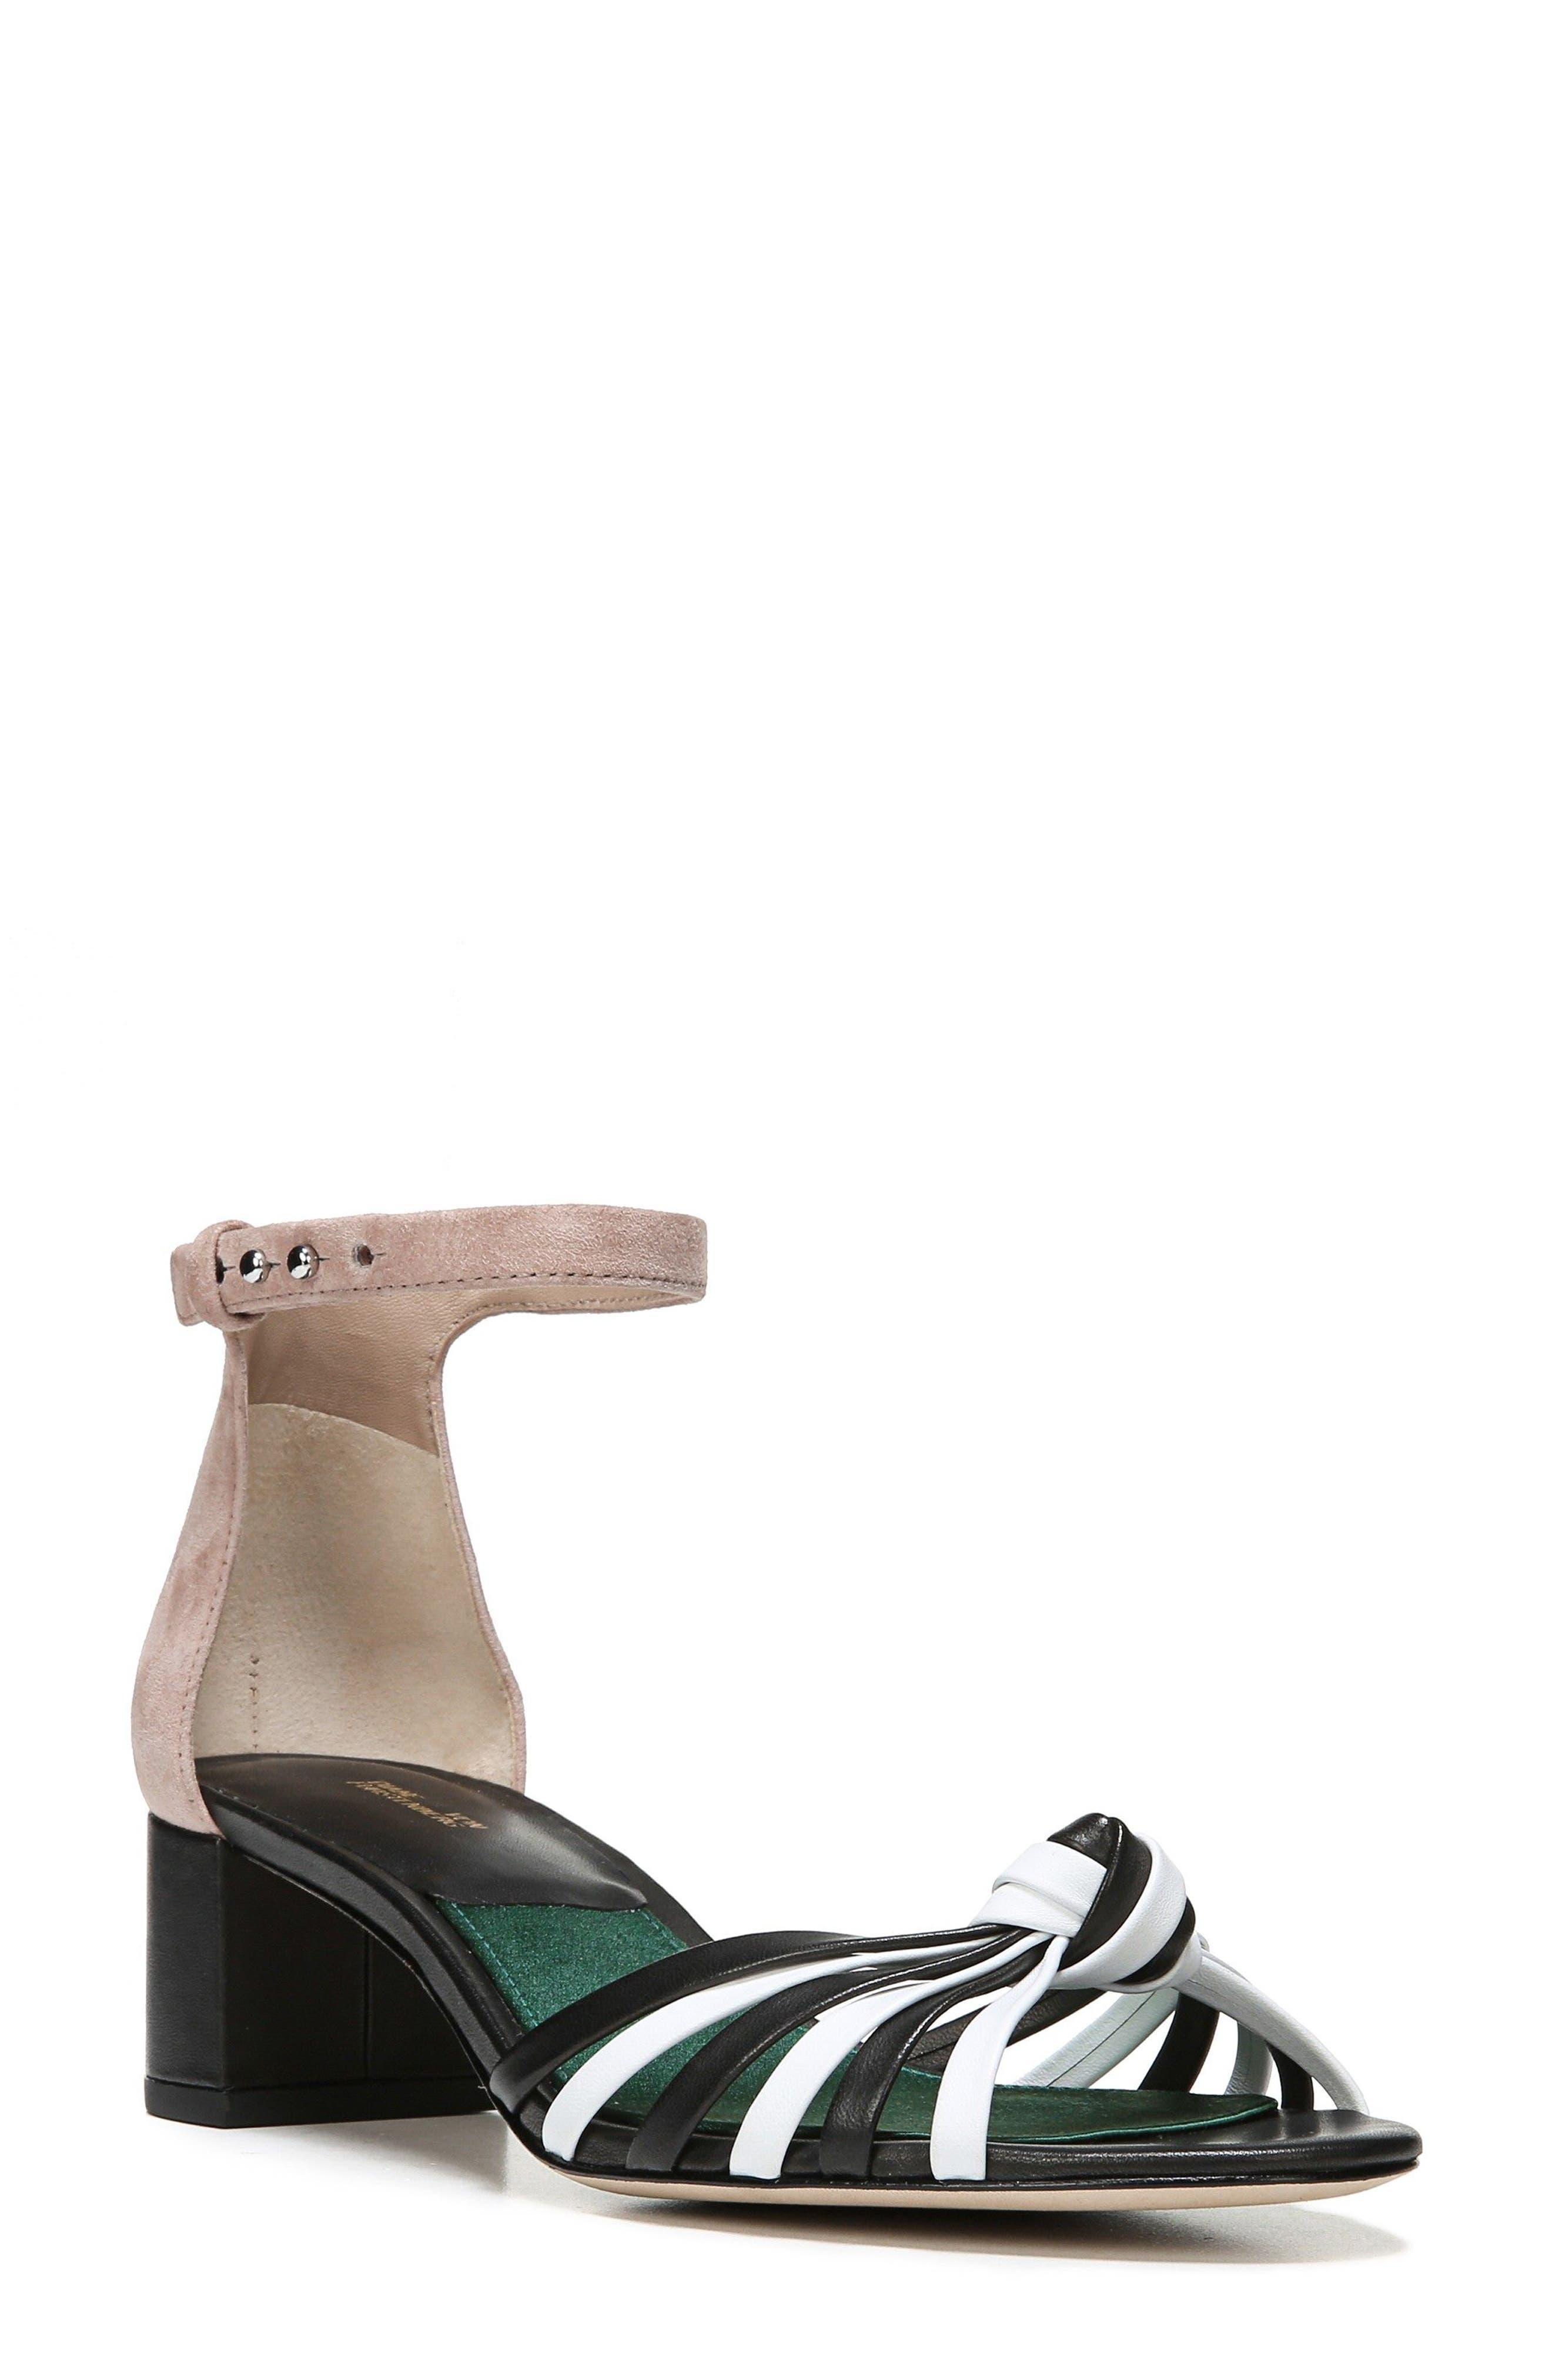 Fonseca Ankle Strap Sandal,                         Main,                         color, 001